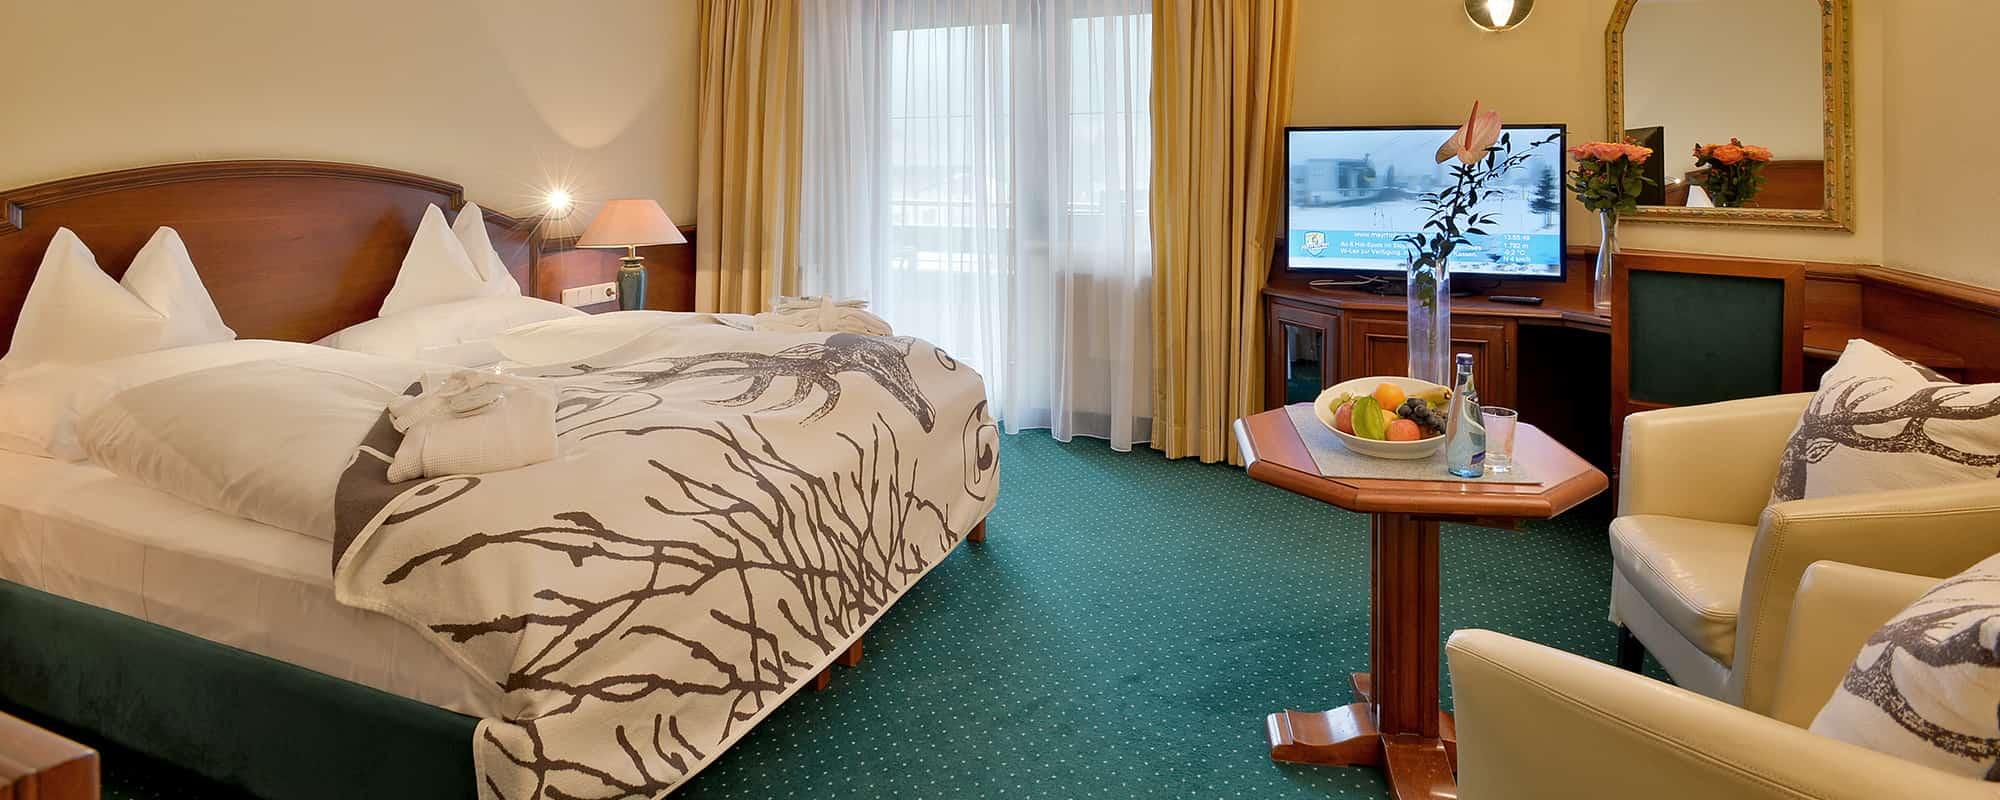 MANNI Classic Room doppelbett mit fernseher